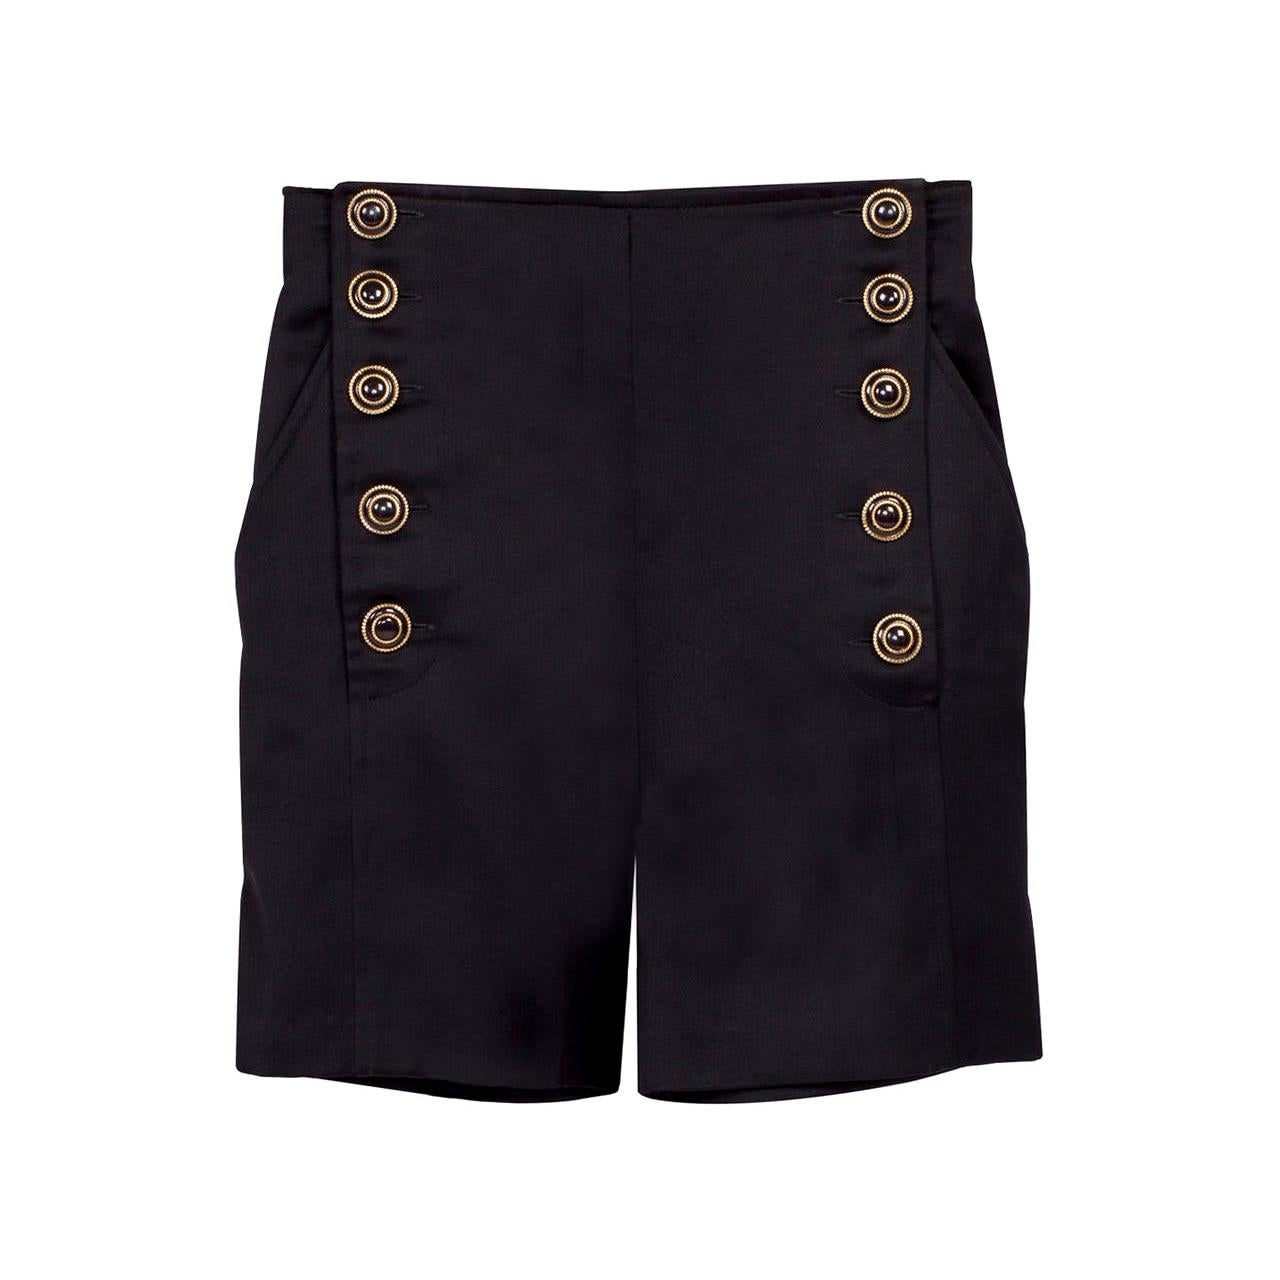 Versus Gianni Versace Black Marine High Waisted Shorts